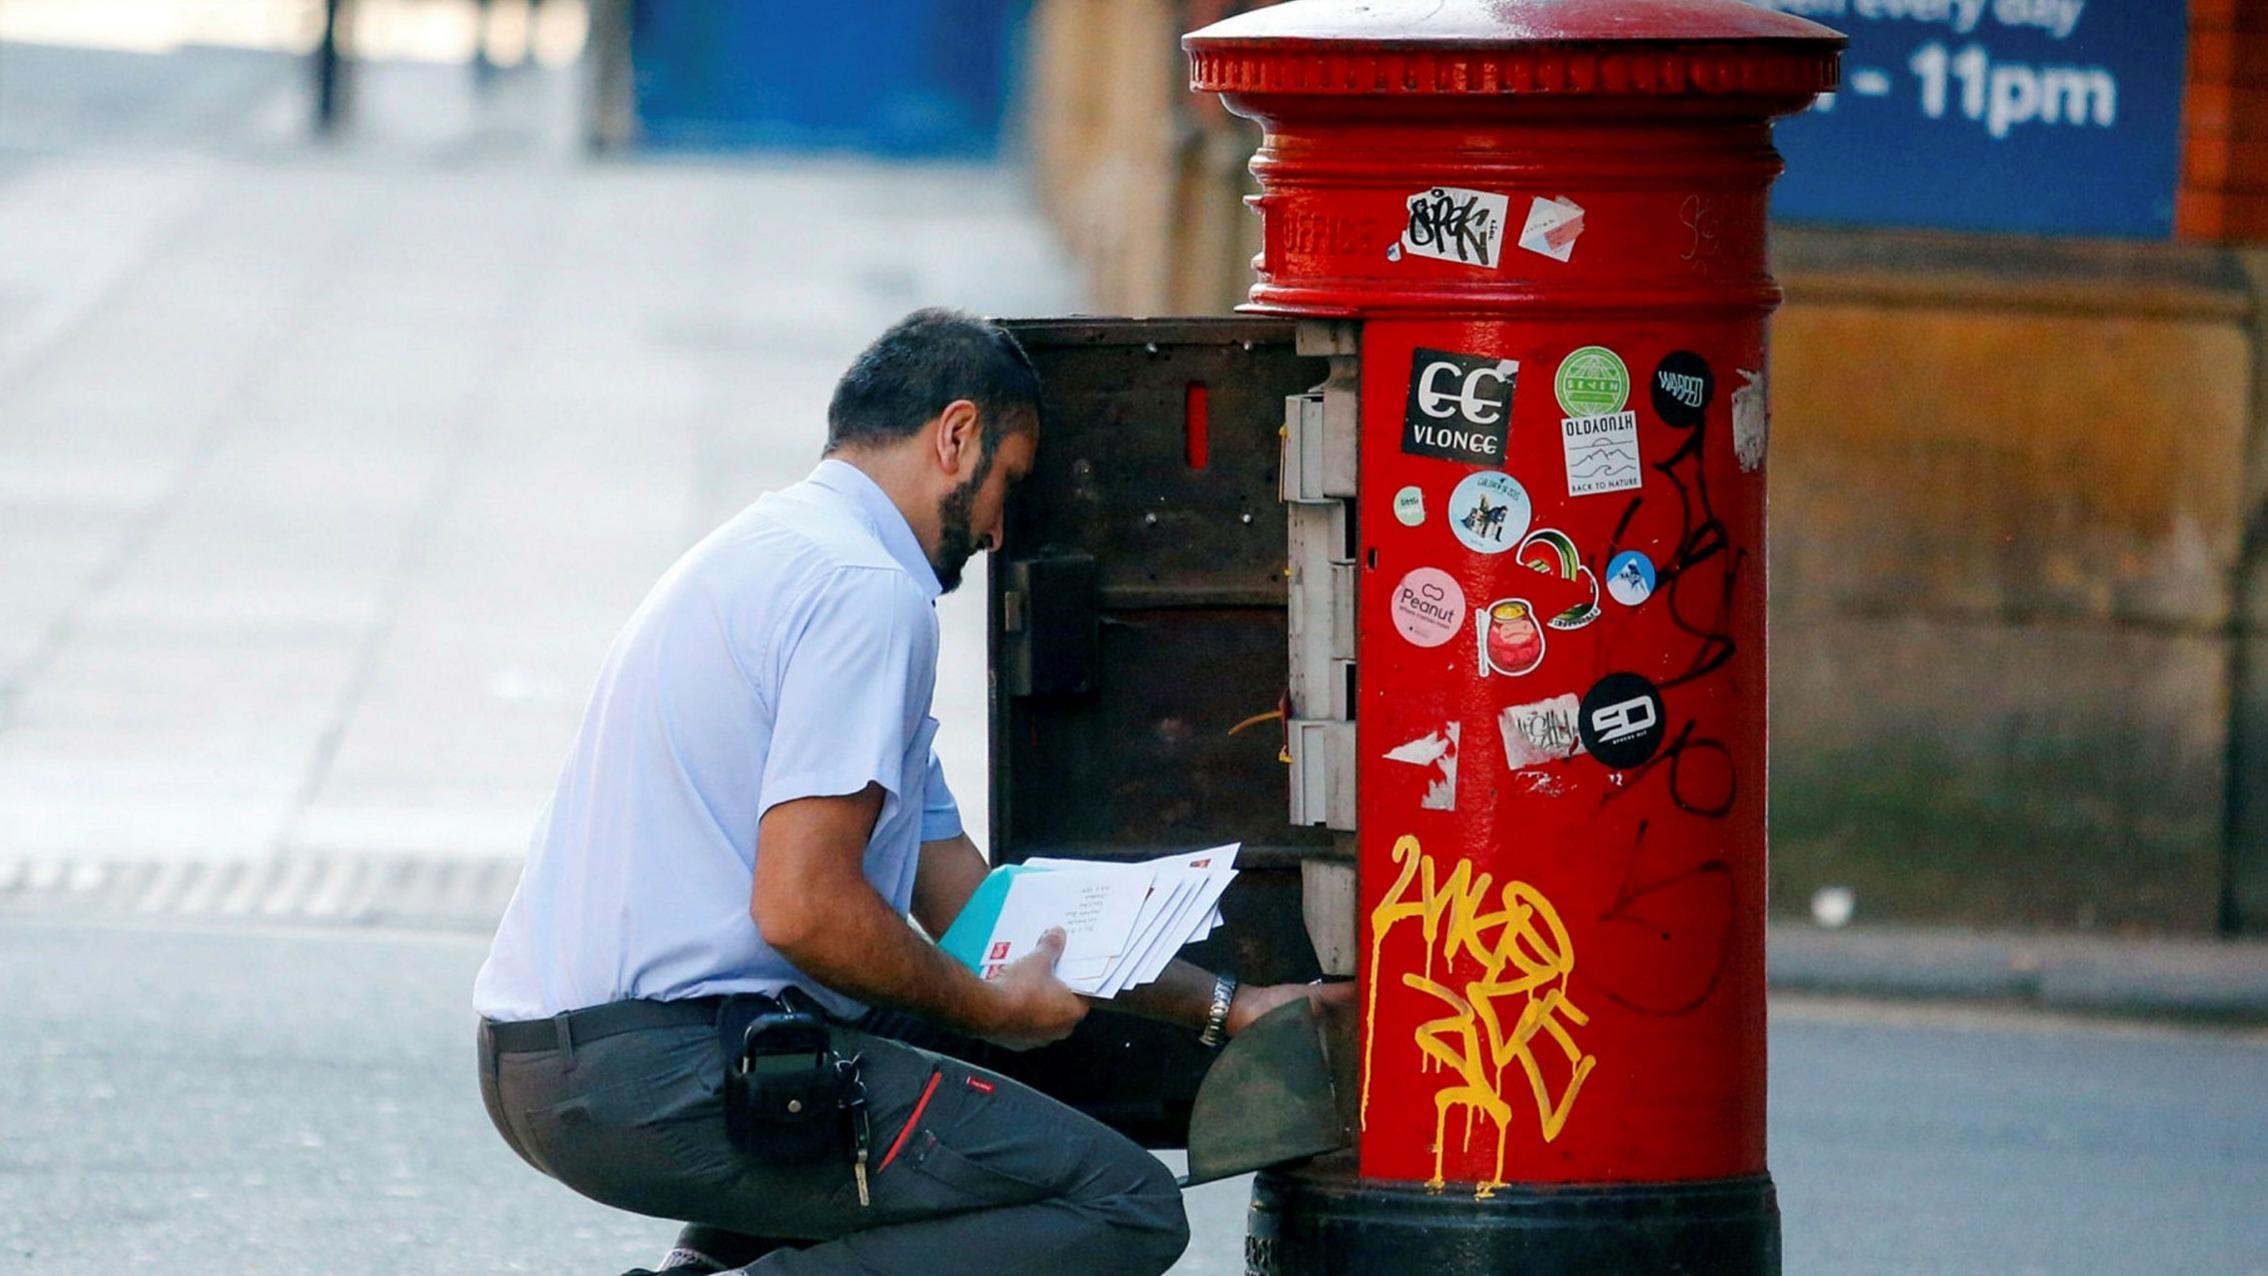 Royal Mail Raises Of 1st Class